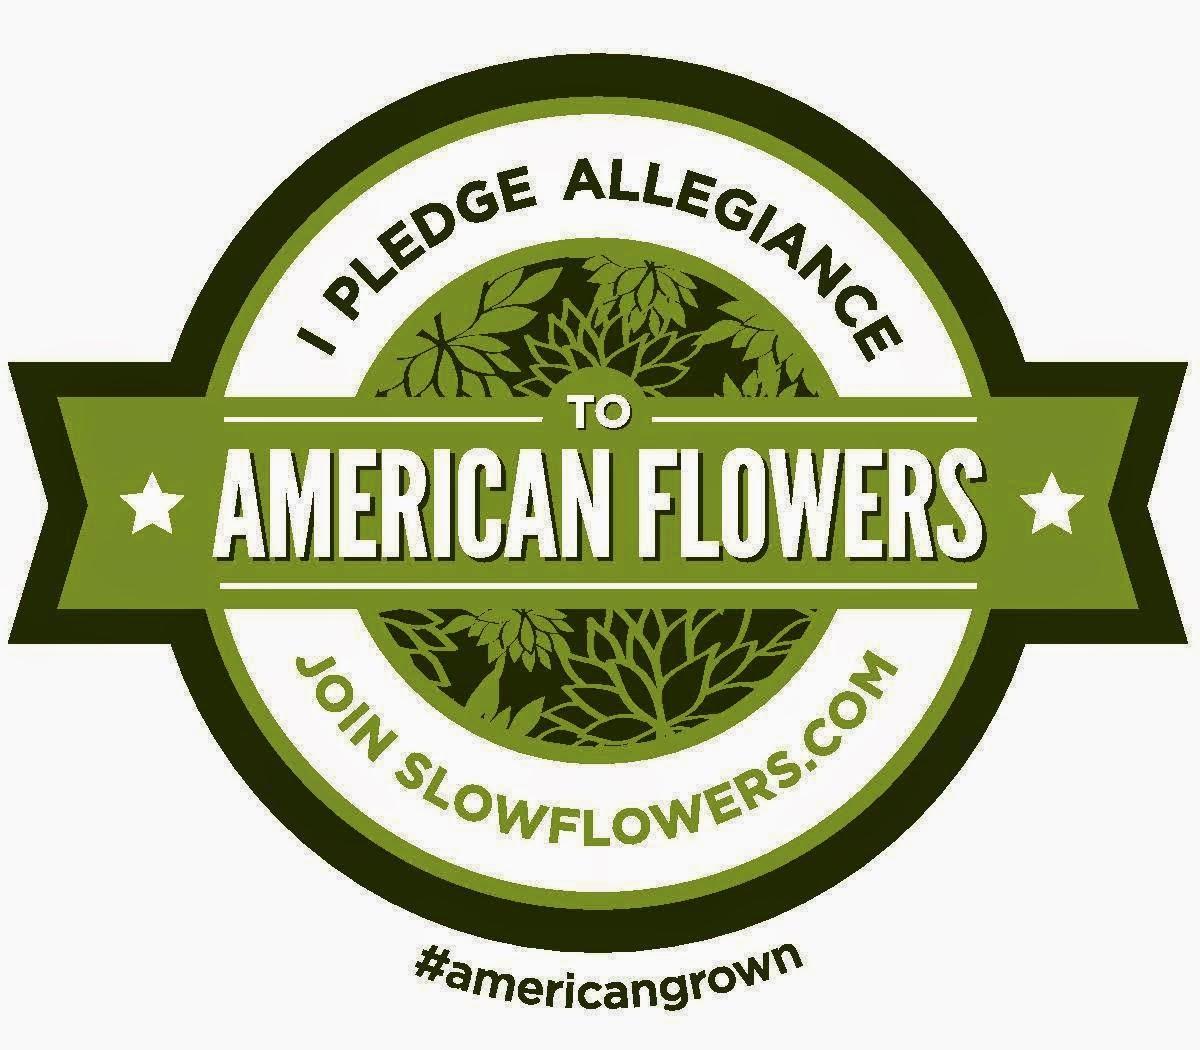 We love local flowers!